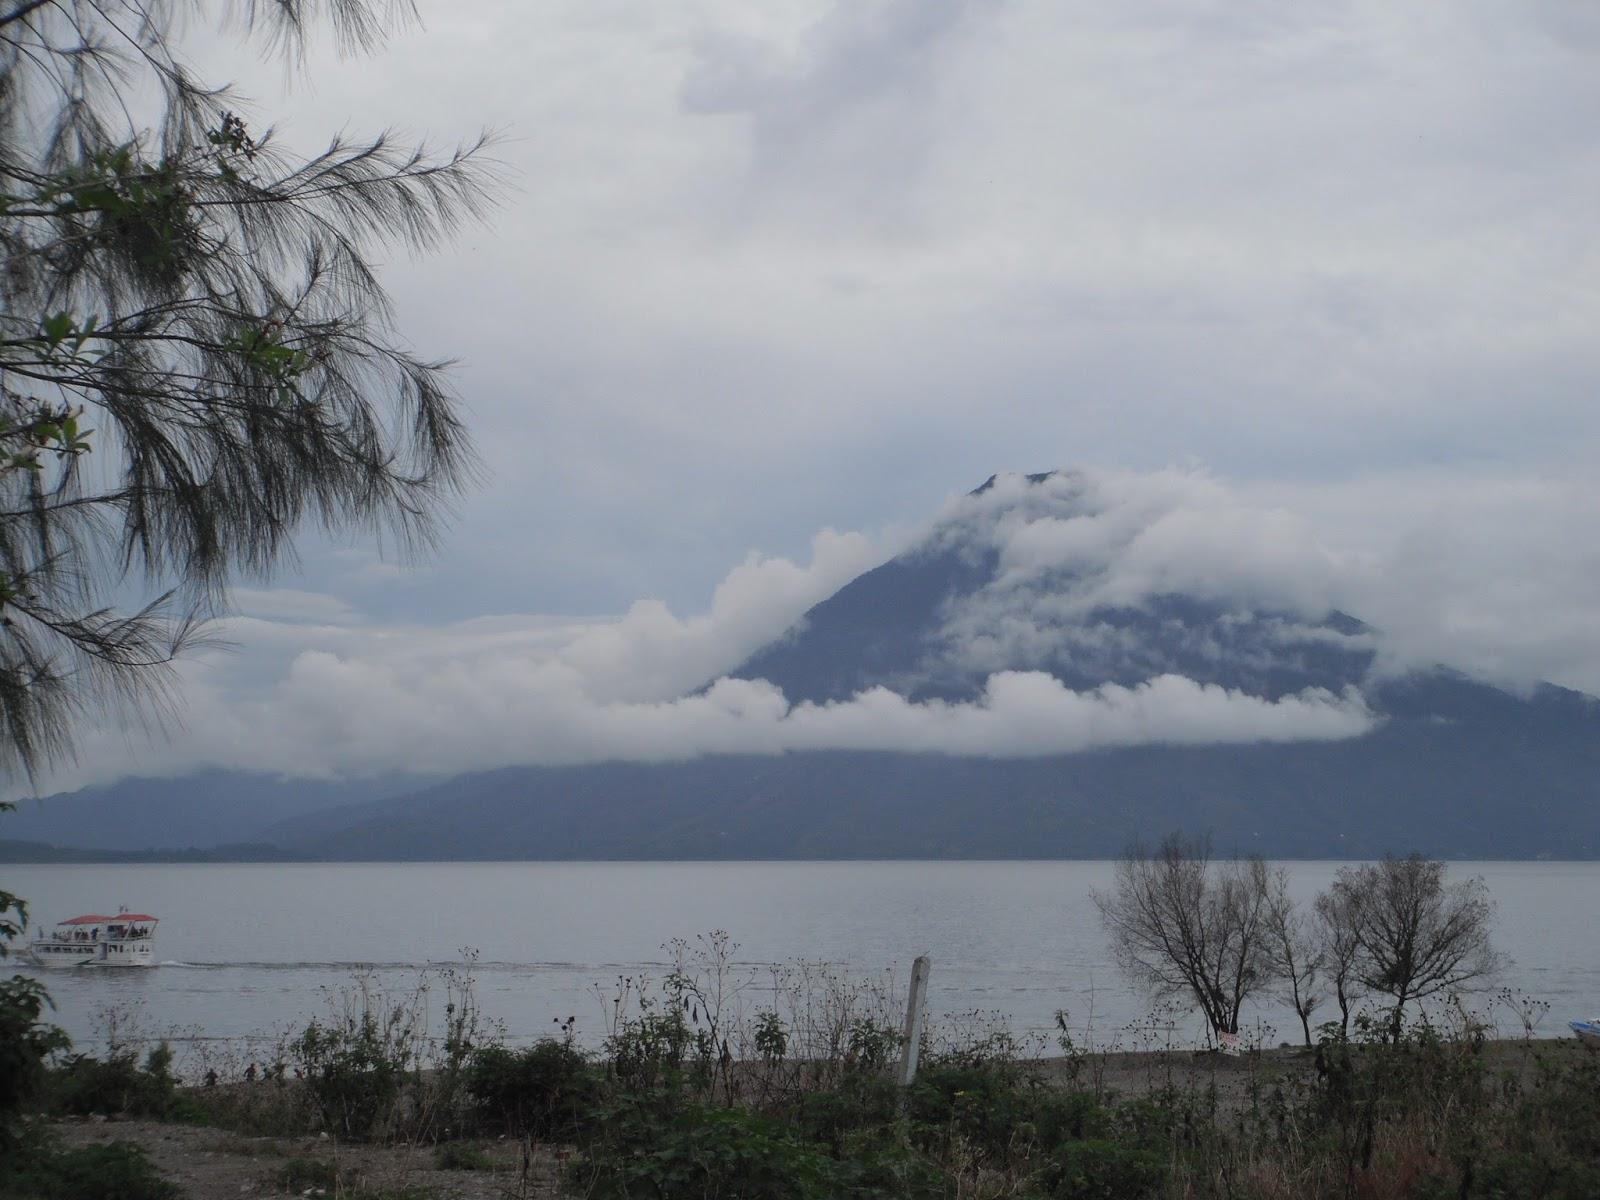 Chasing Marbles: Rainy Season Travel Tips For Guatemala